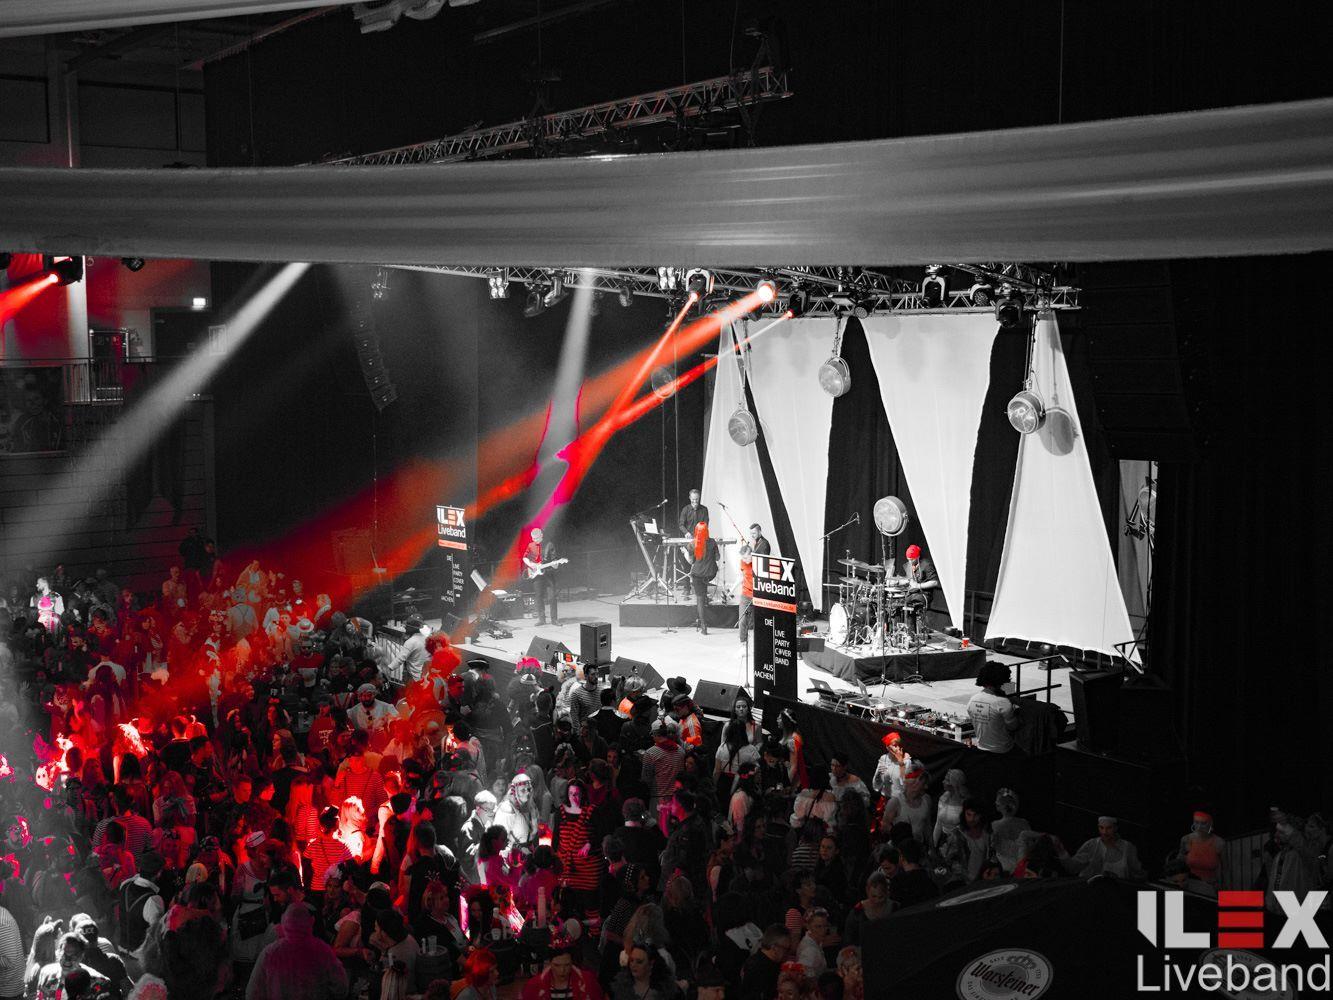 Liveband Ilex Die Live Party Coverband Aus Aachen